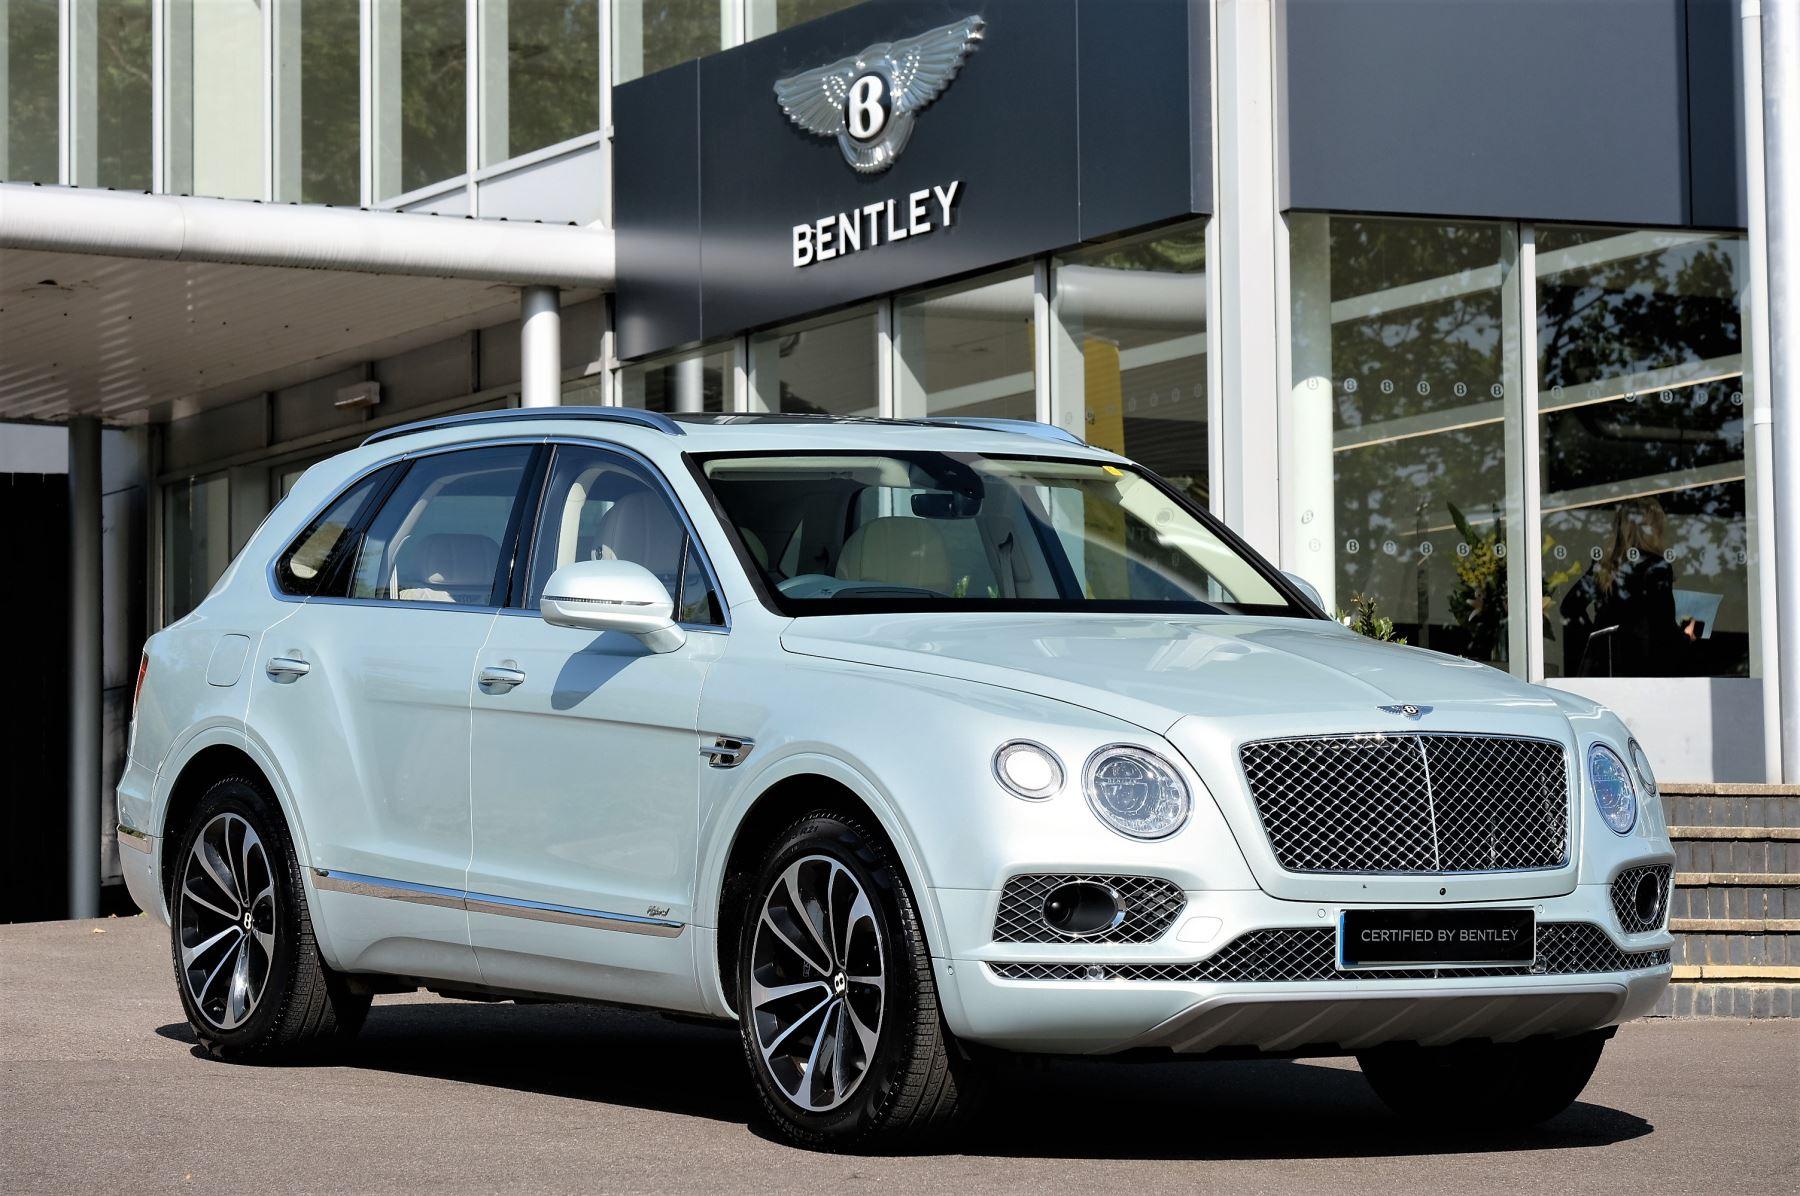 Bentley Bentayga 3.0 V6 Hybrid Mulliner Driving Specification 5dr Petrol/Electric Automatic Estate (2019)